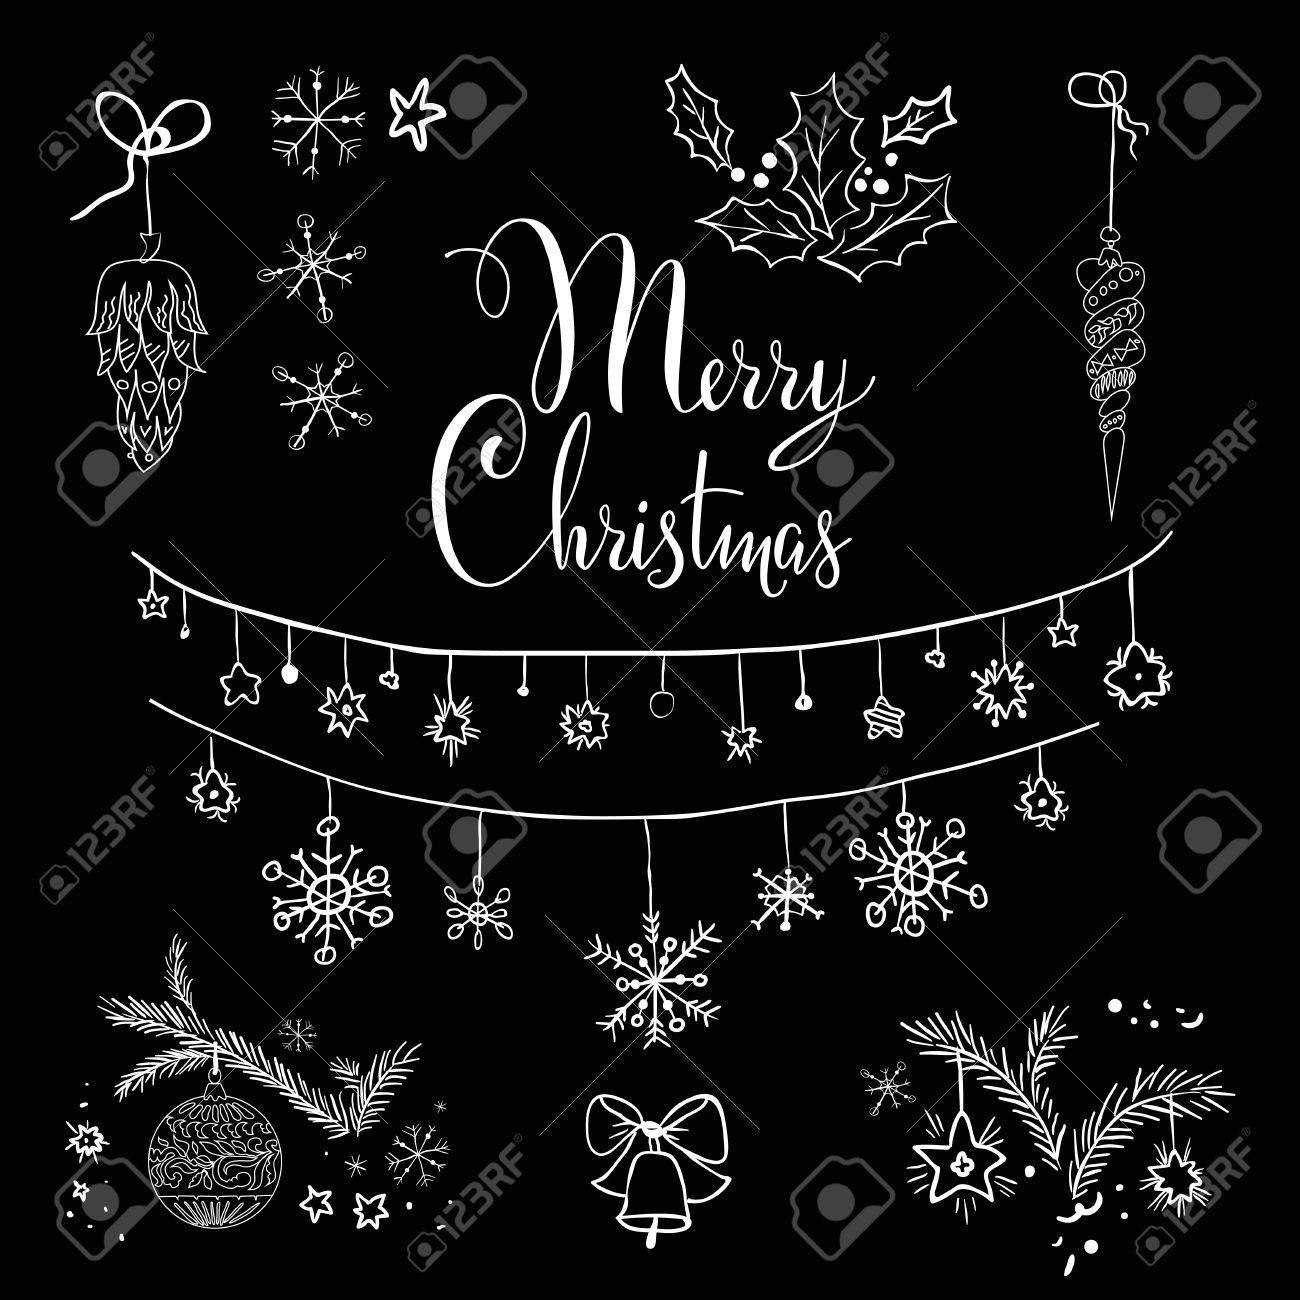 Christmas Board Design.Christmas Design Set On Black Board